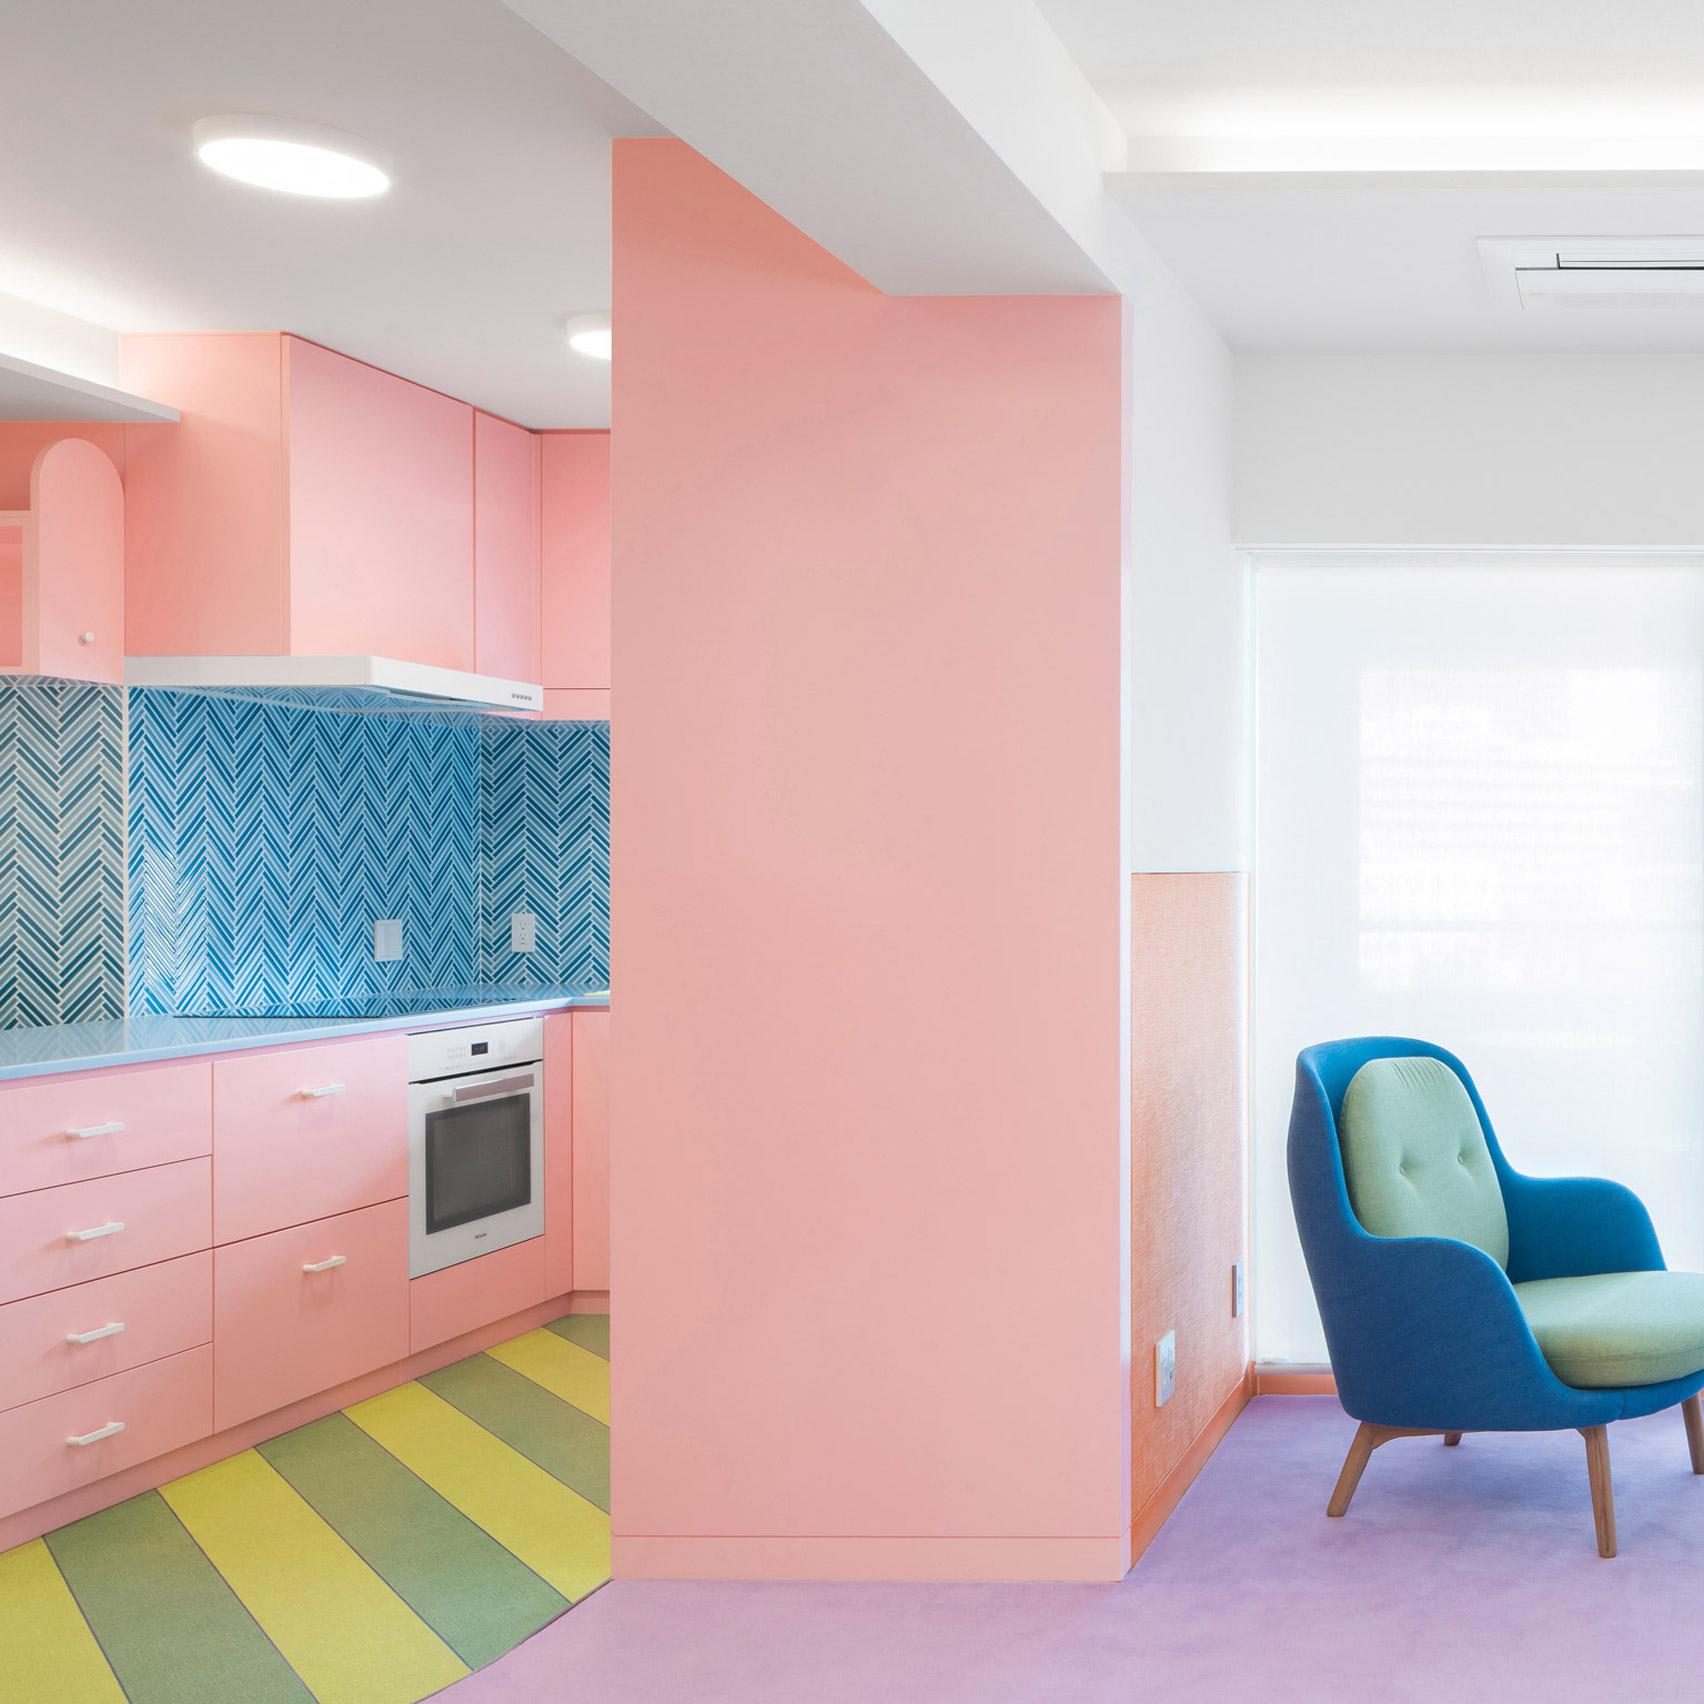 Dezeen's top home interiors of 2020: Nagatachō Apartment by Adam Nathanial Furman